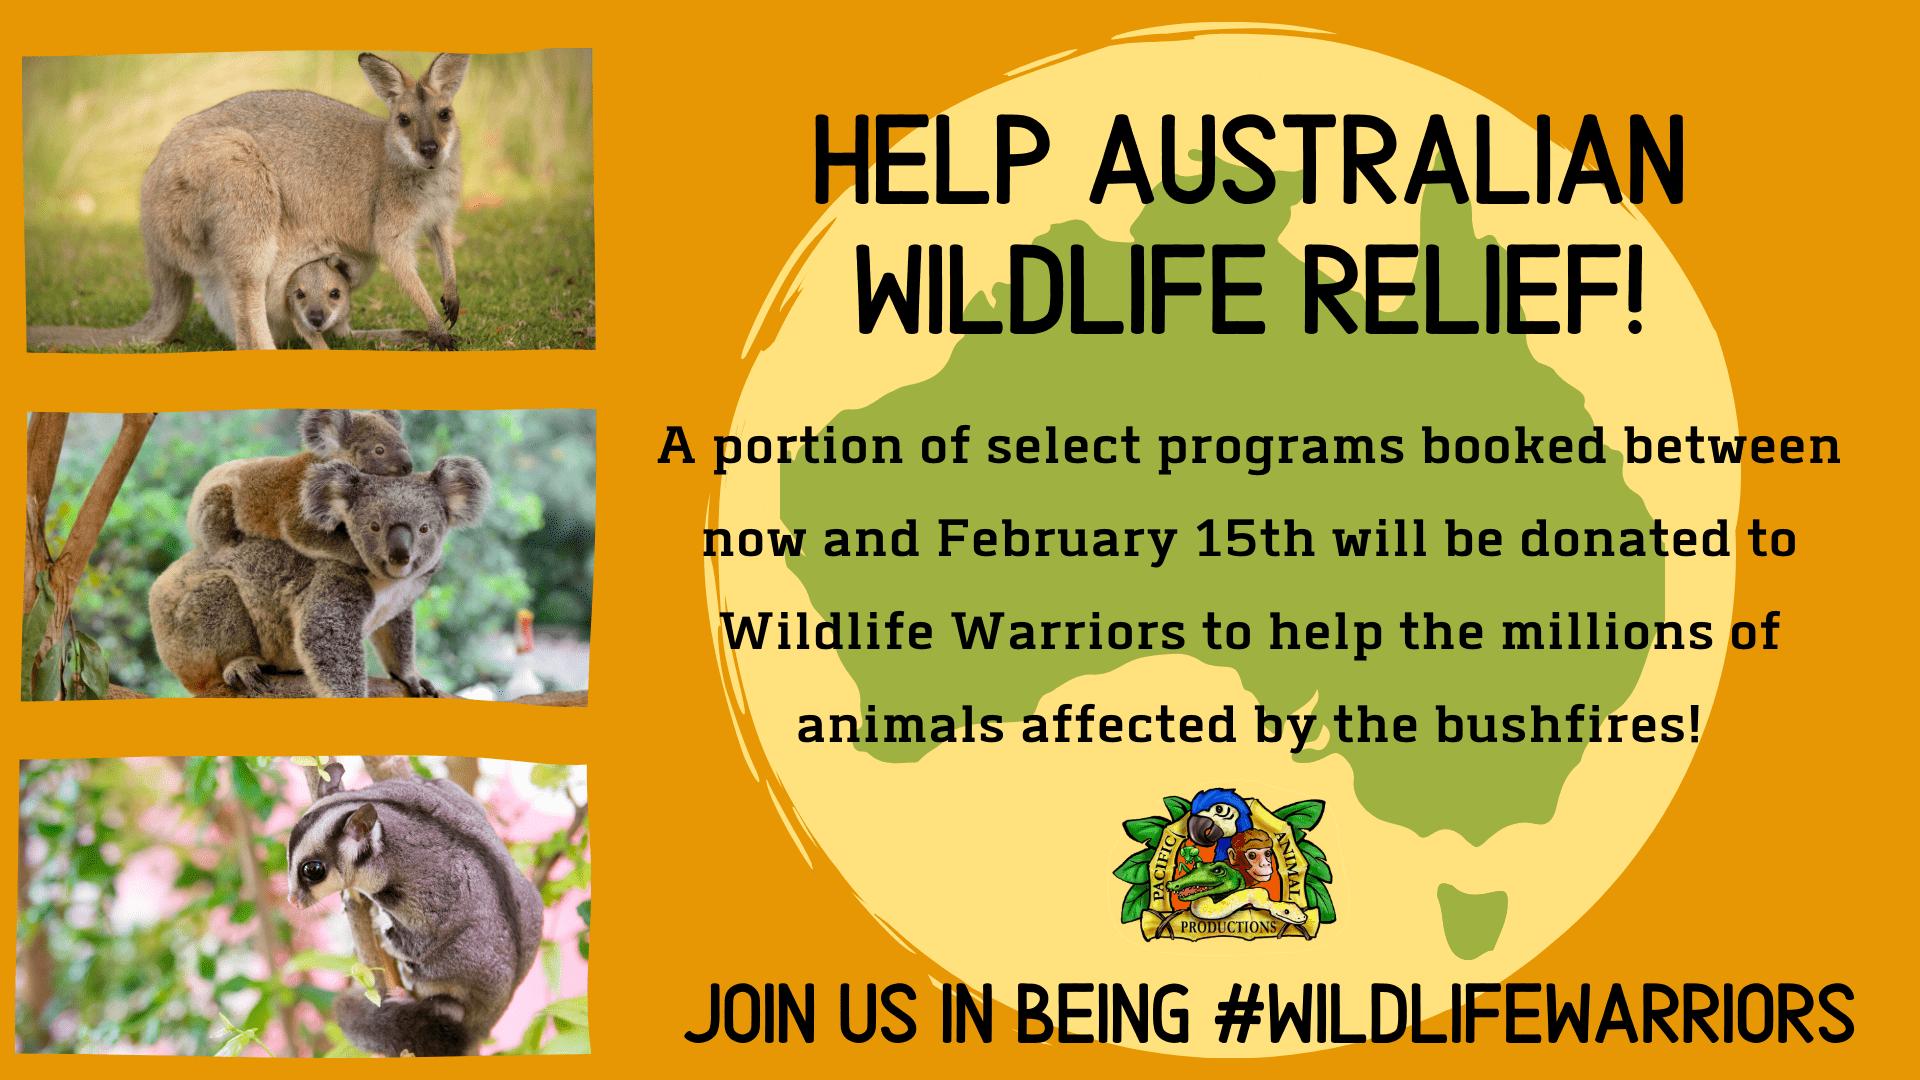 Australian Wildlife Relief Fundraiser